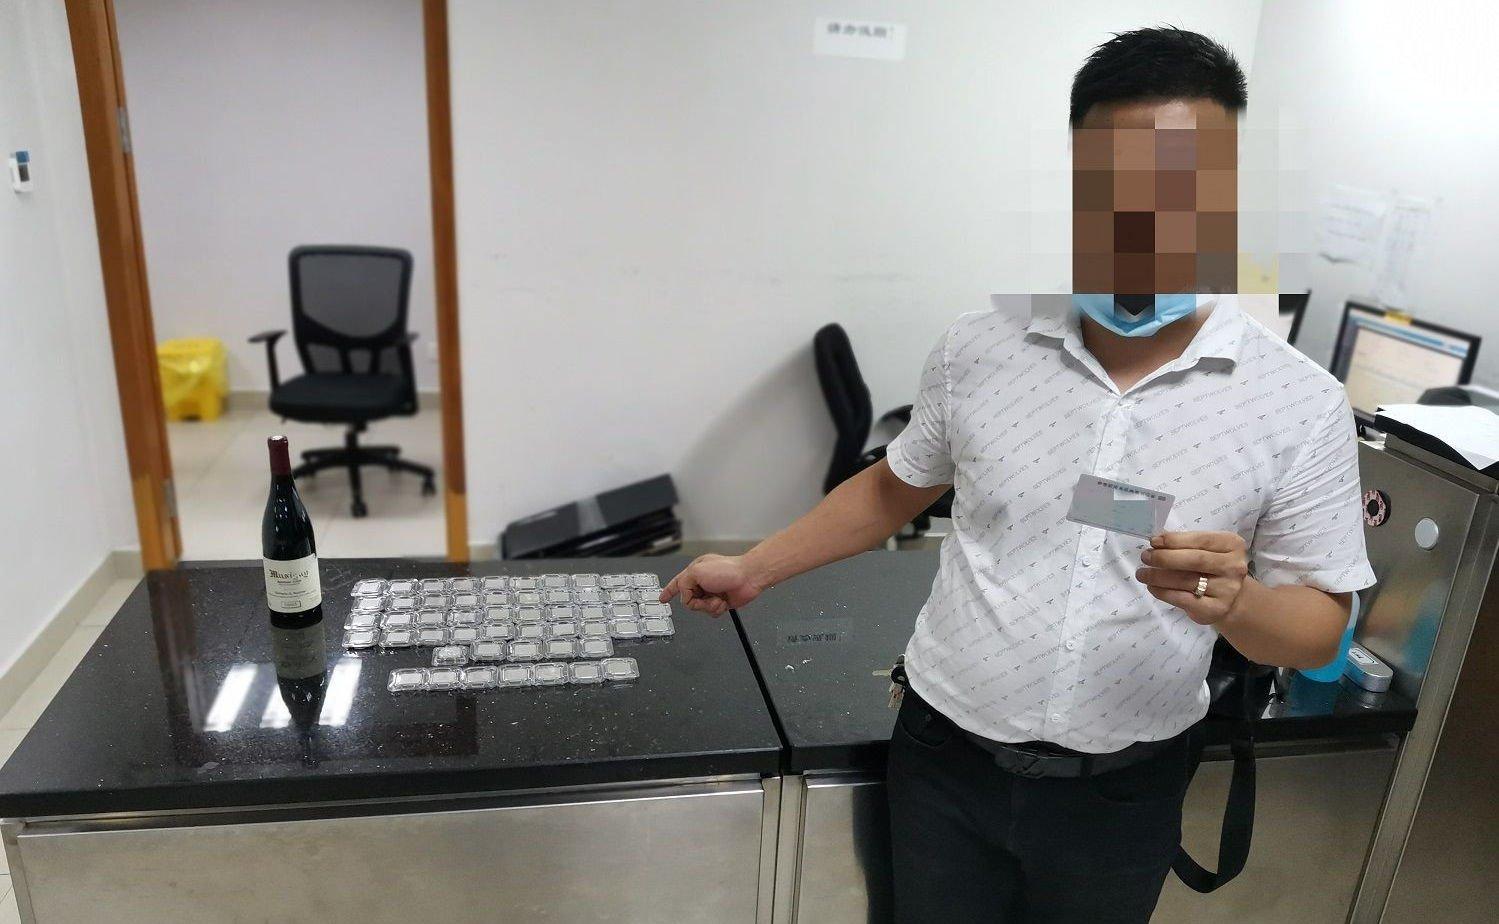 Таможня Гонконга задержала контрабандиста с тремя сотнями процессоров Intel Core i7/i9